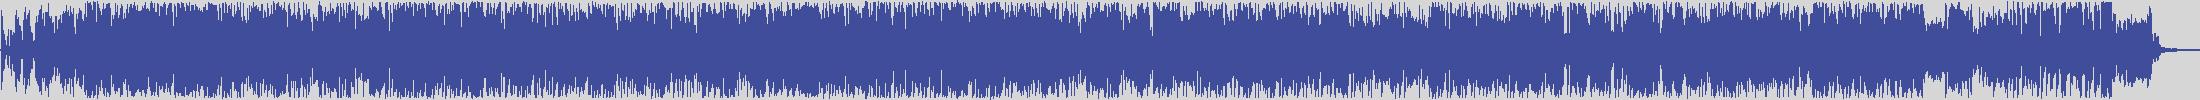 smilax_dig_records [SDR001] Luis David, Juan - Te Odio [Original Mix] audio wave form